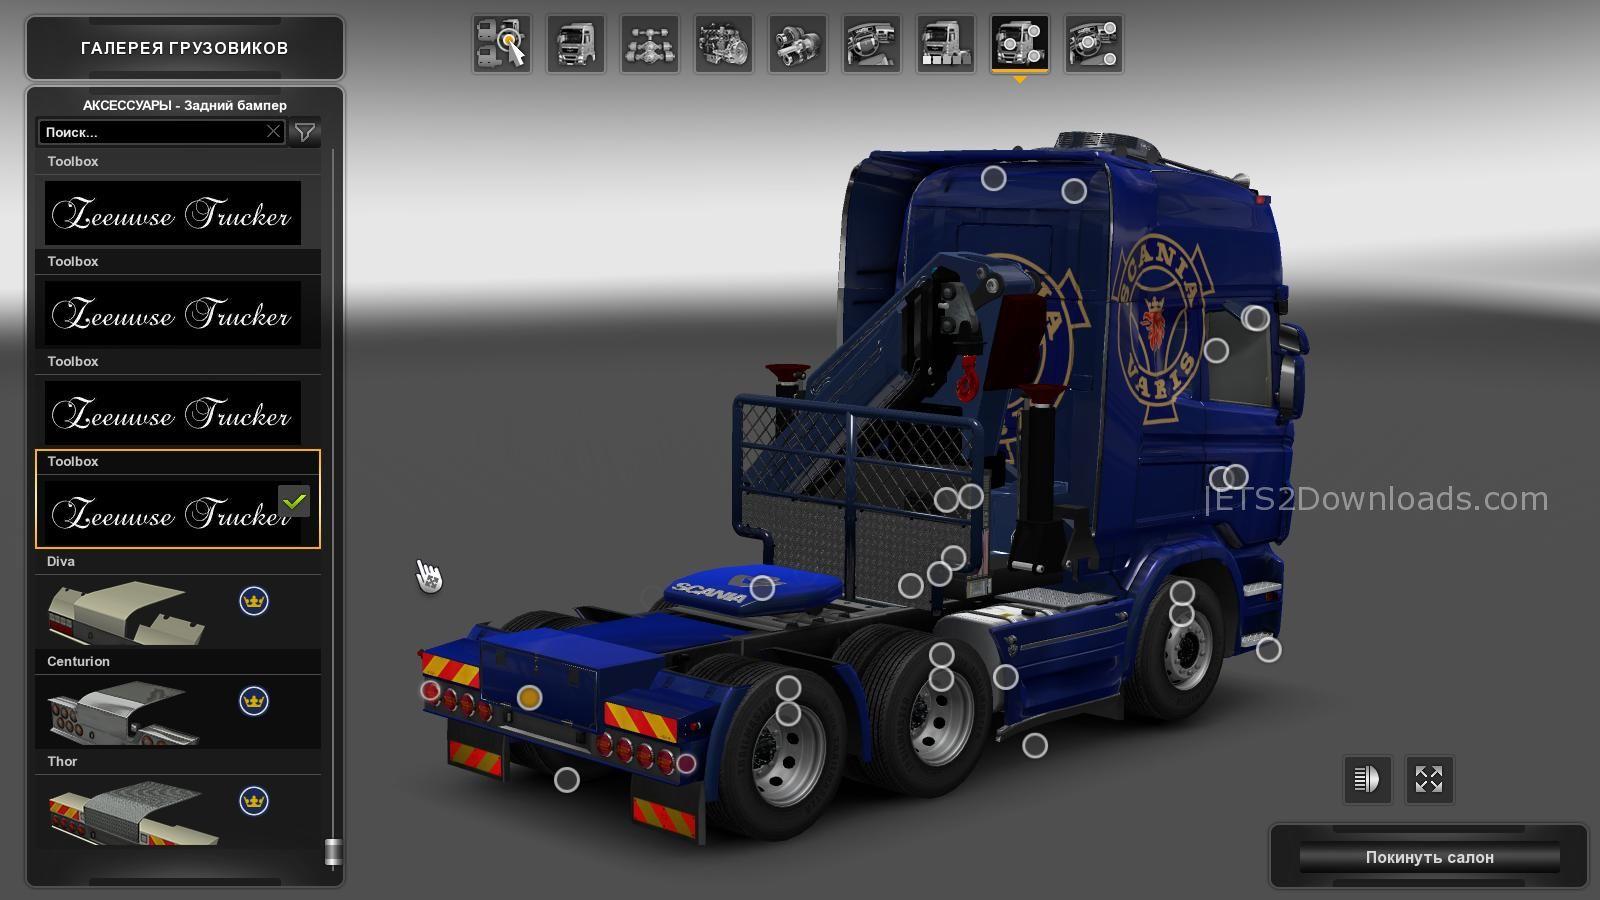 scania-r-scs-tuning-beta-2-zeeuwse-trucker-3